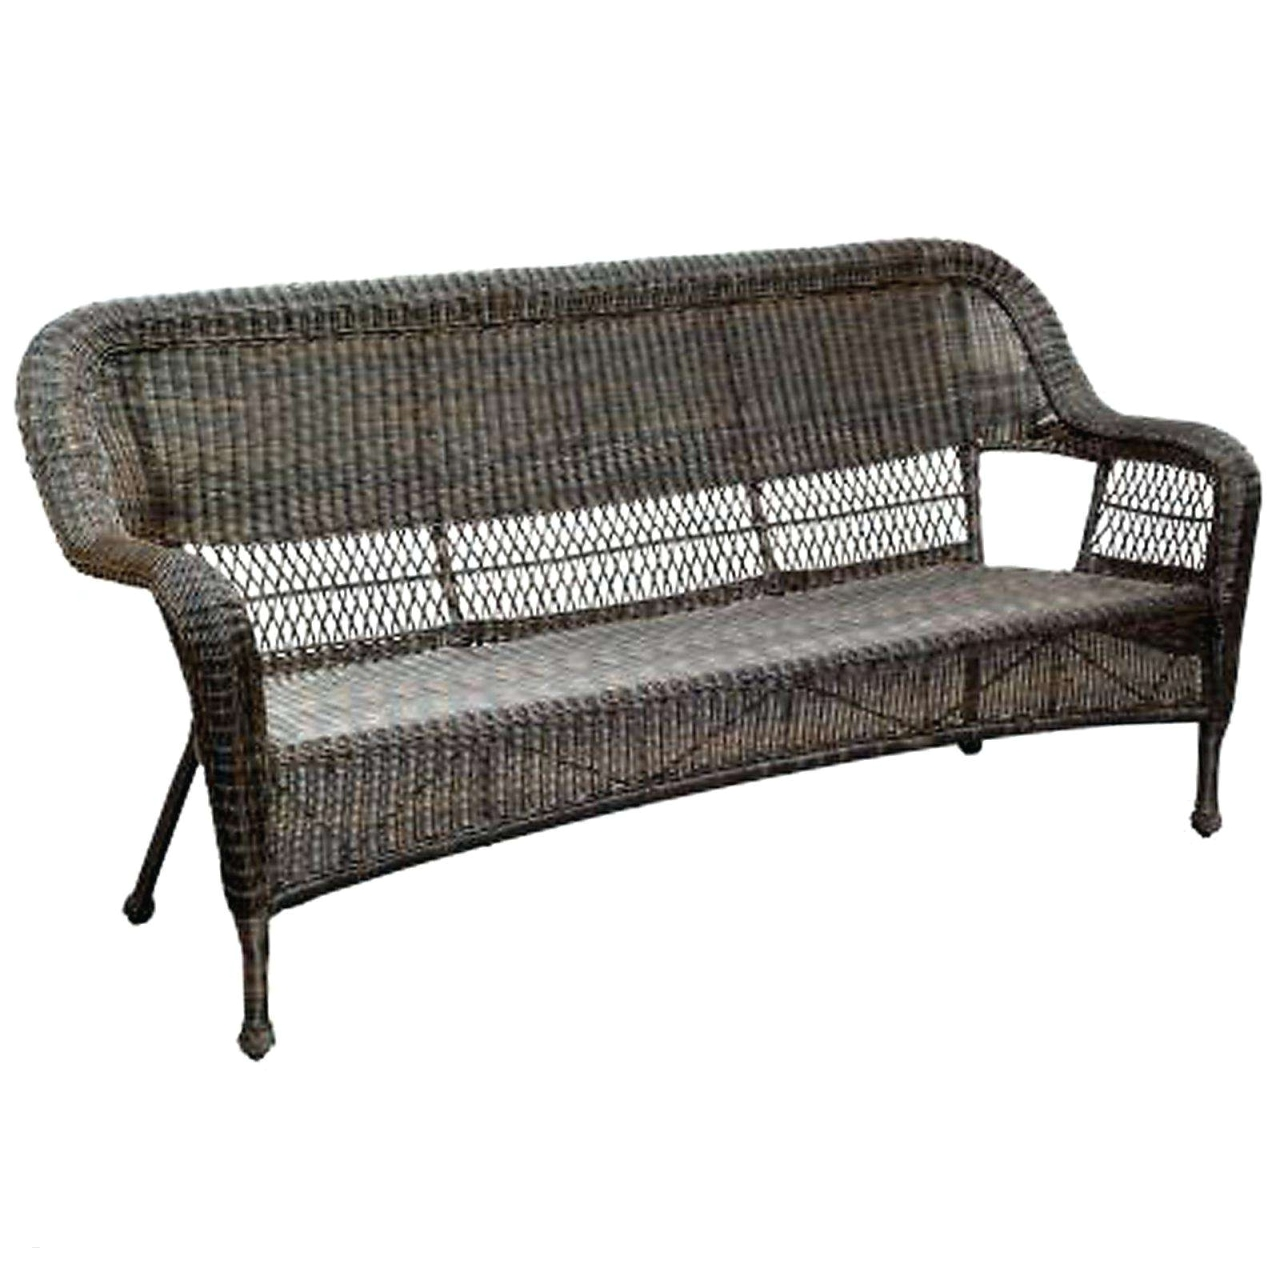 image of outdoor patio chair cushions unique wicker outdoor sofa 0d patio